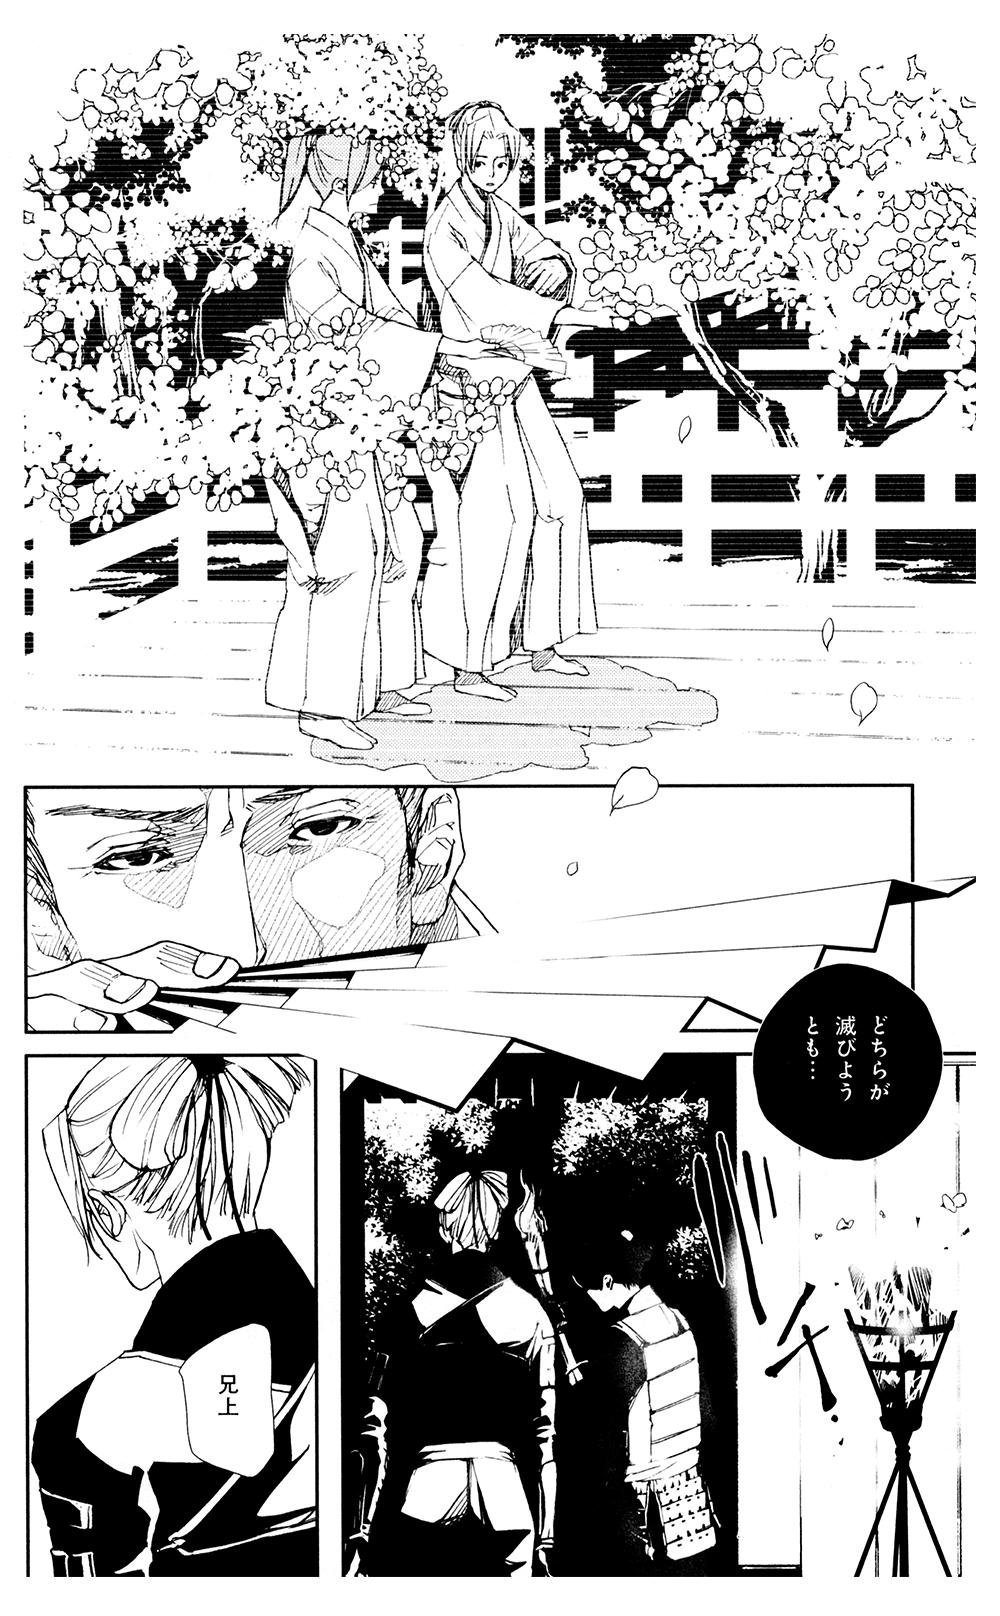 朱黒の仁 第1話①syukoku-1-06.jpg